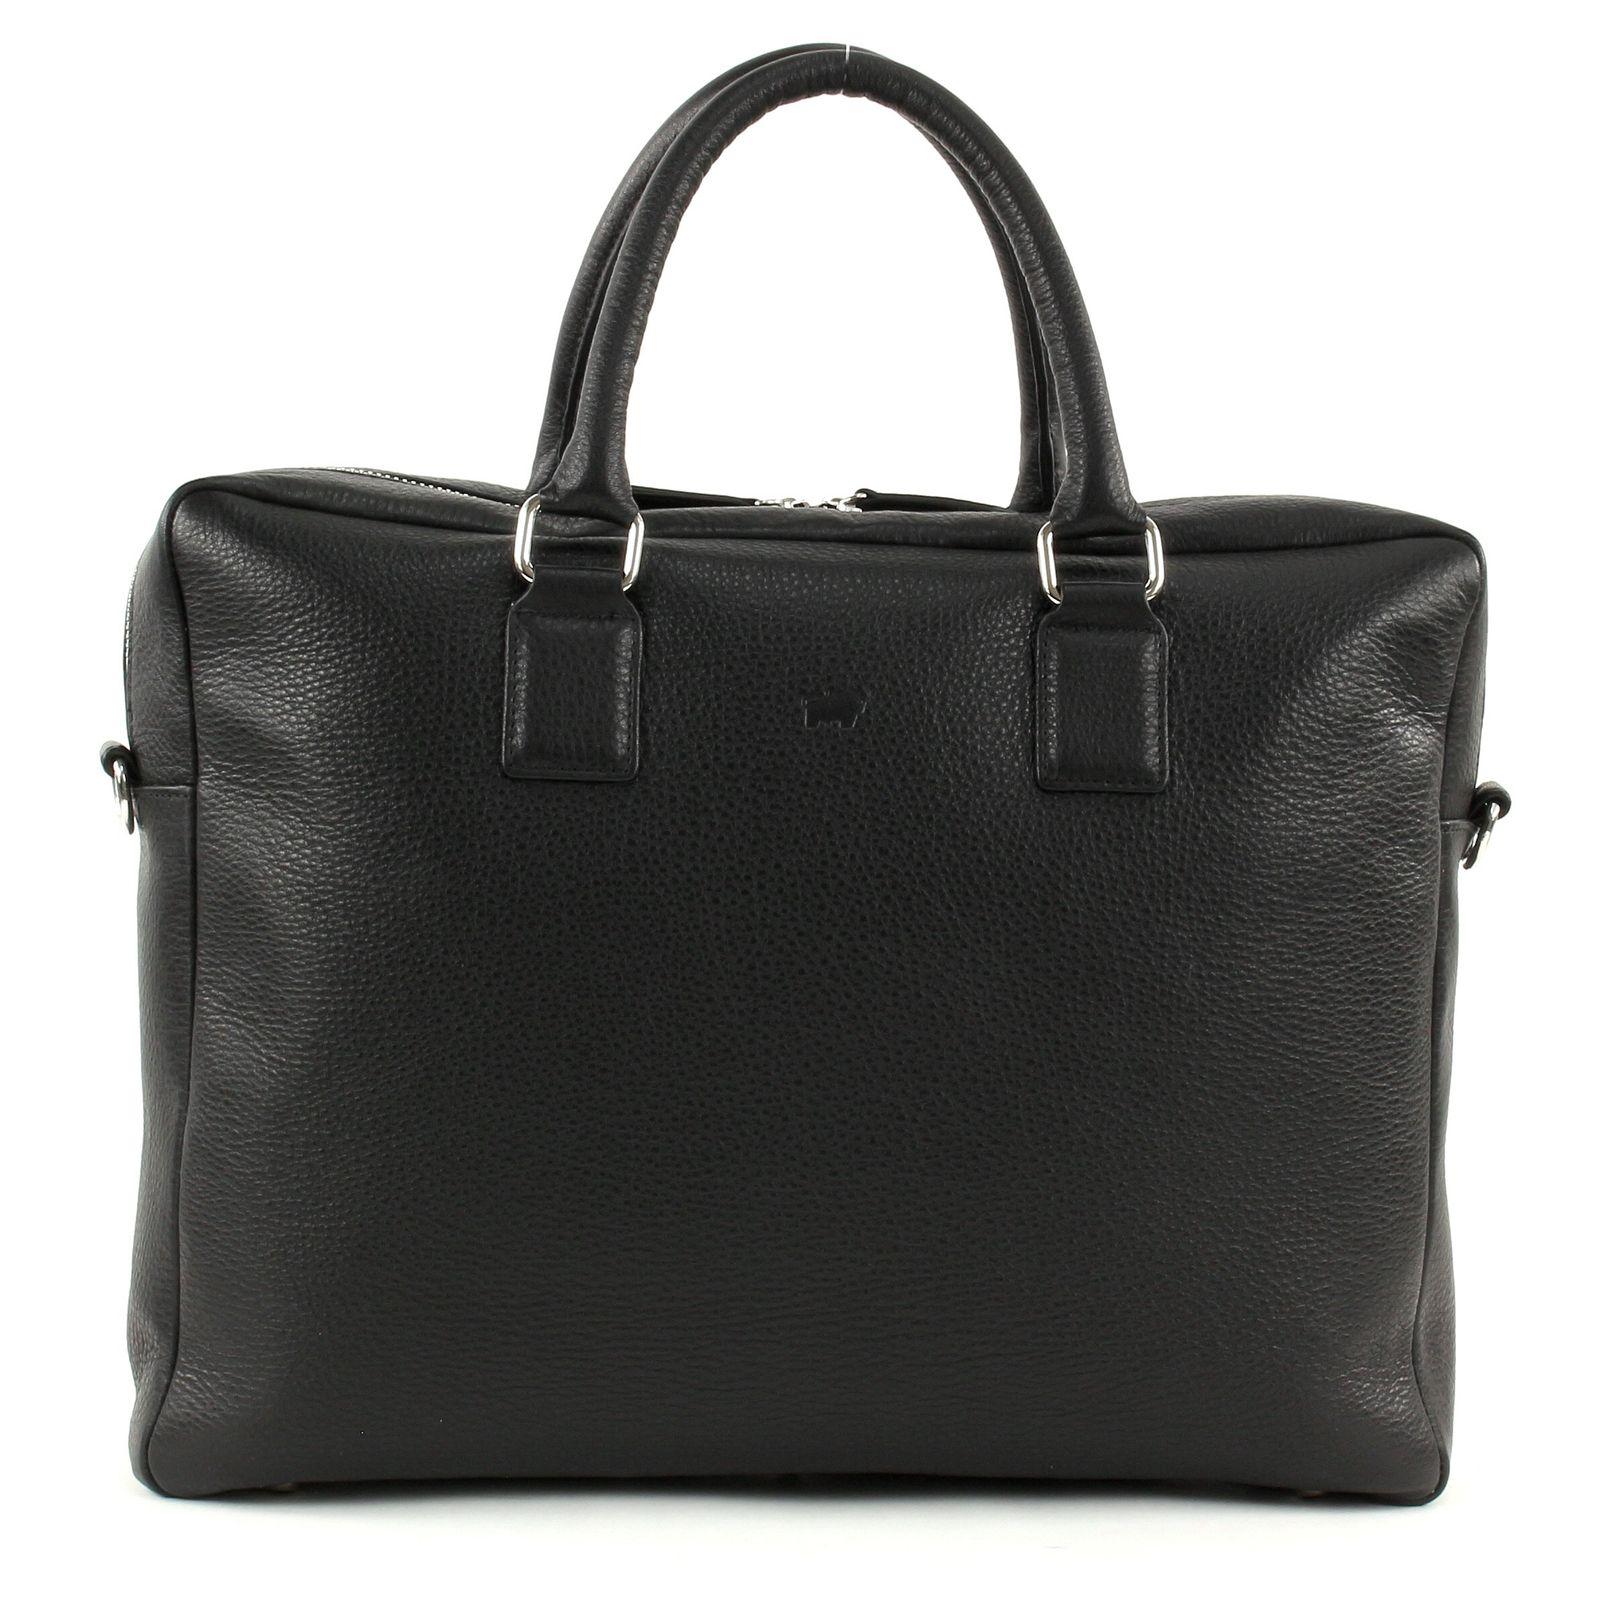 Braun Büffel Savona Business Bag Black